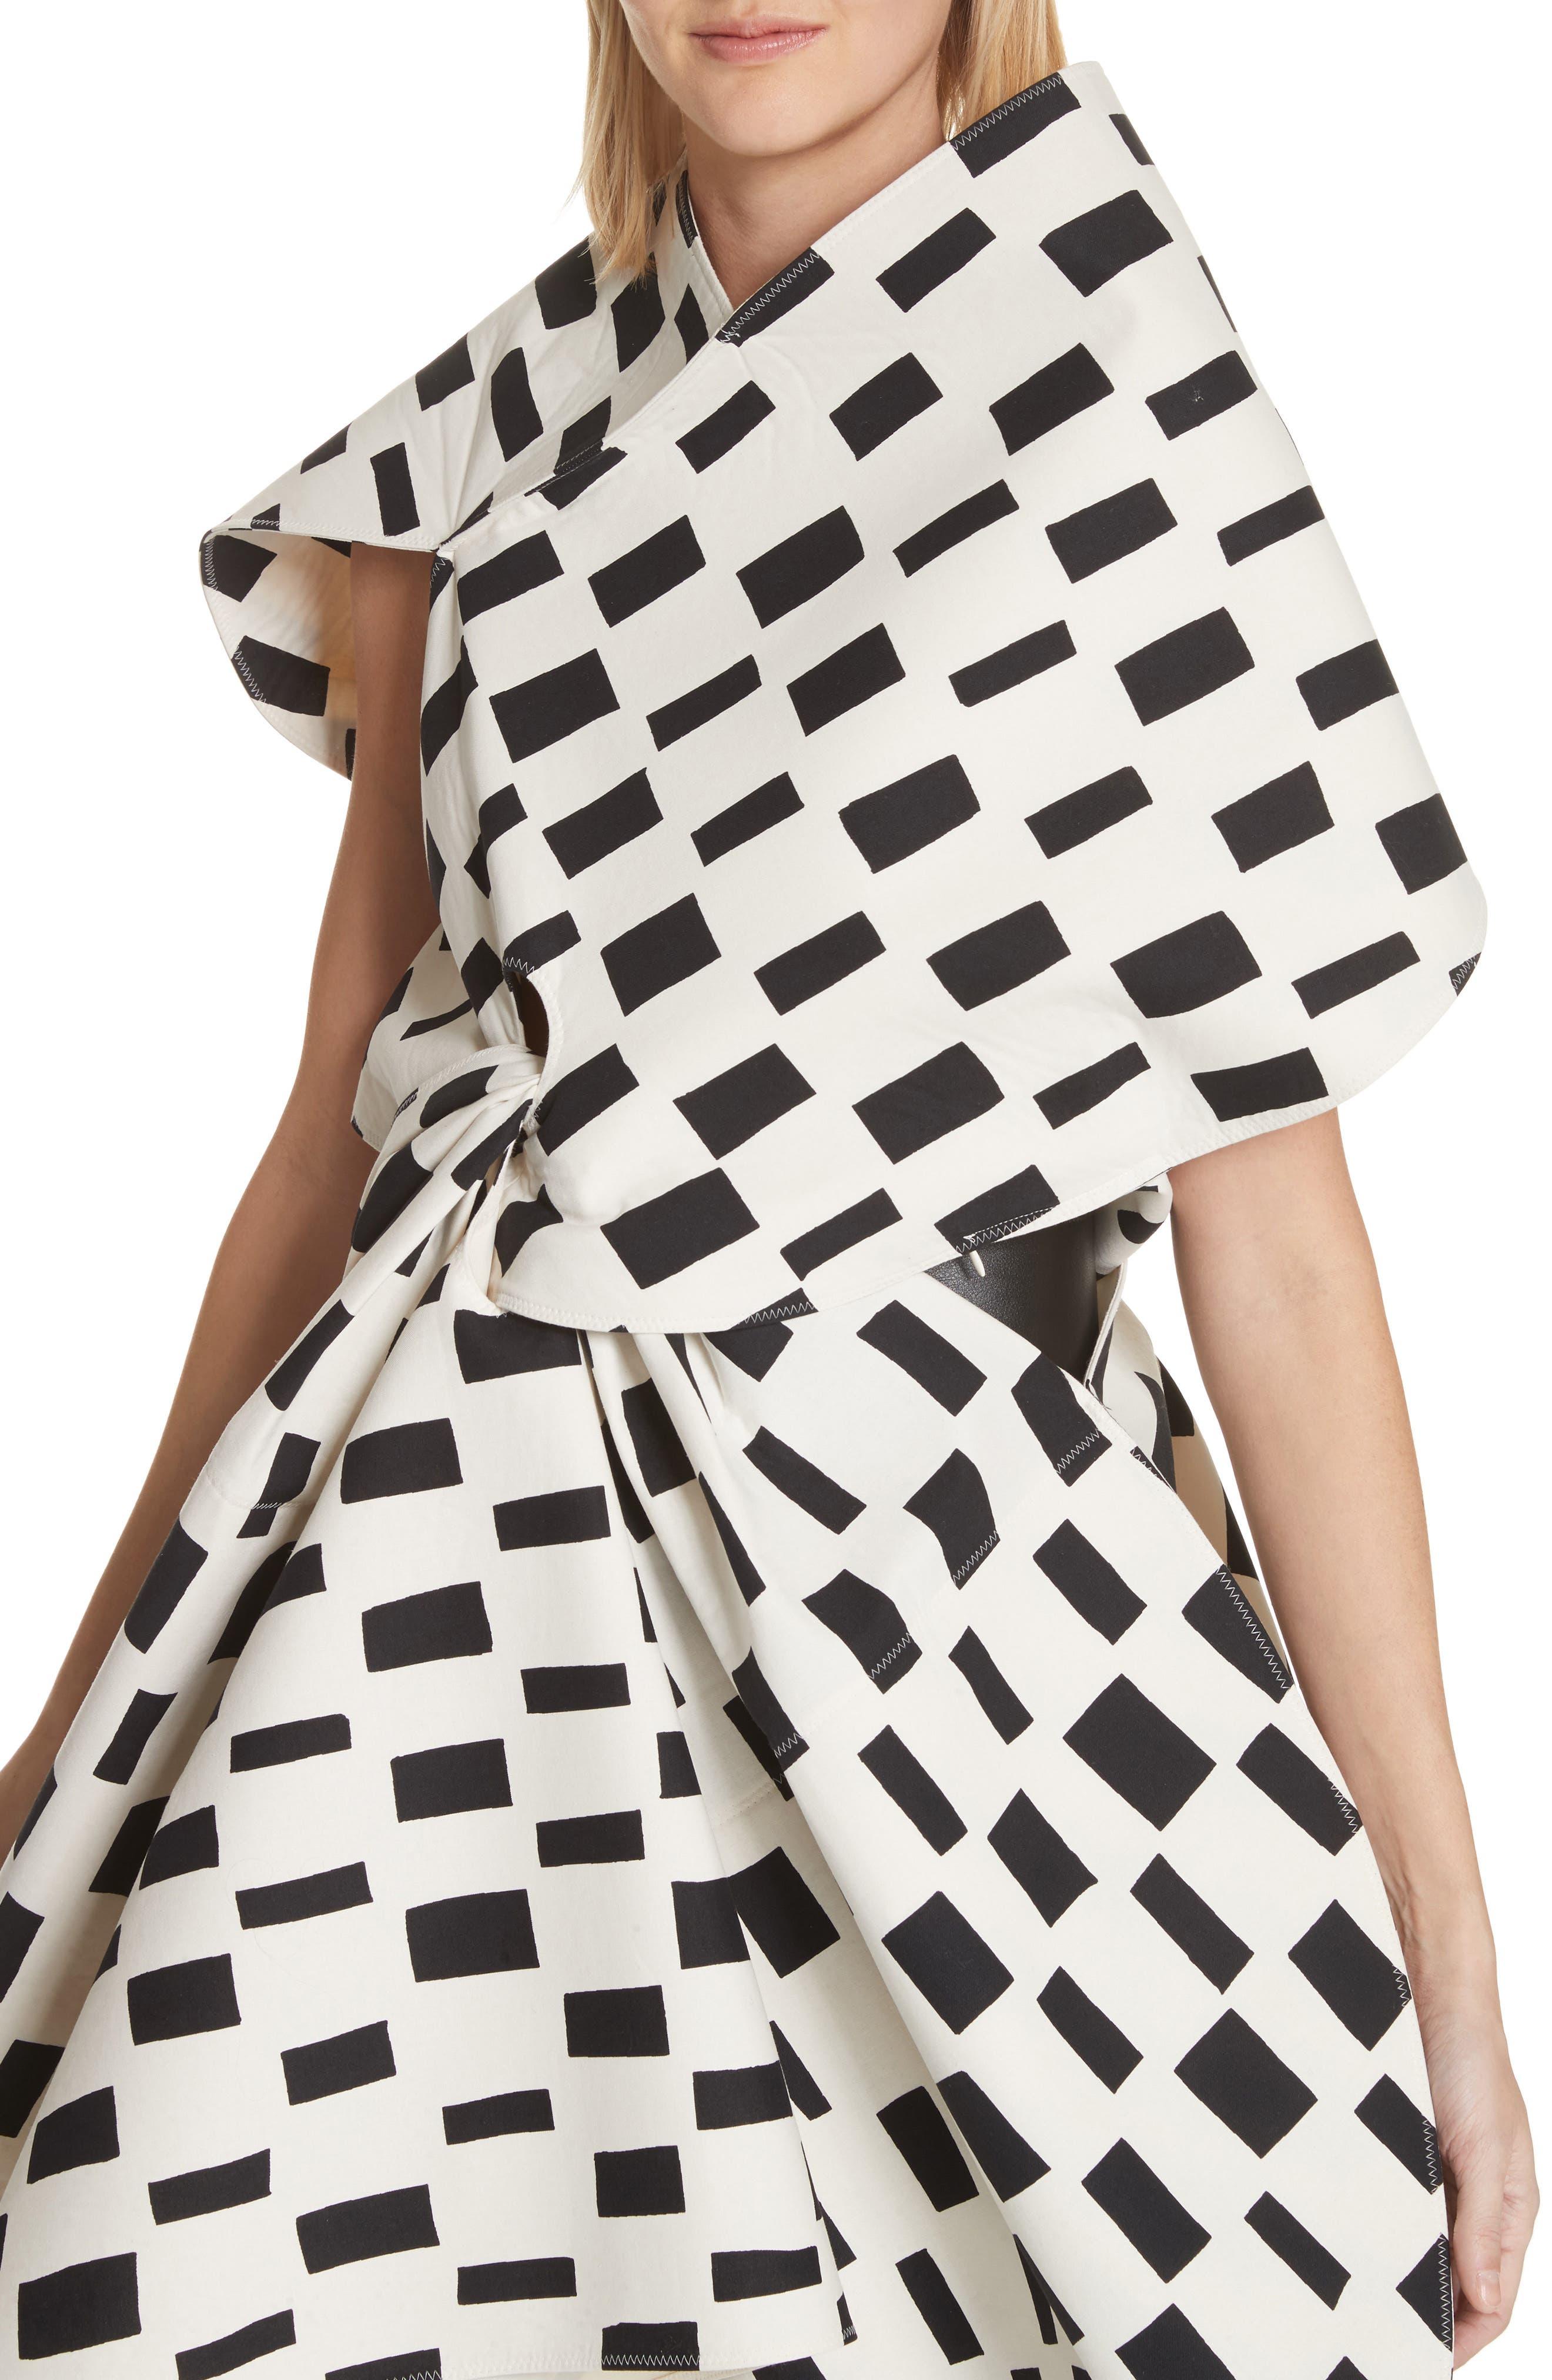 Interweave Geo Print Dress,                             Alternate thumbnail 4, color,                             900